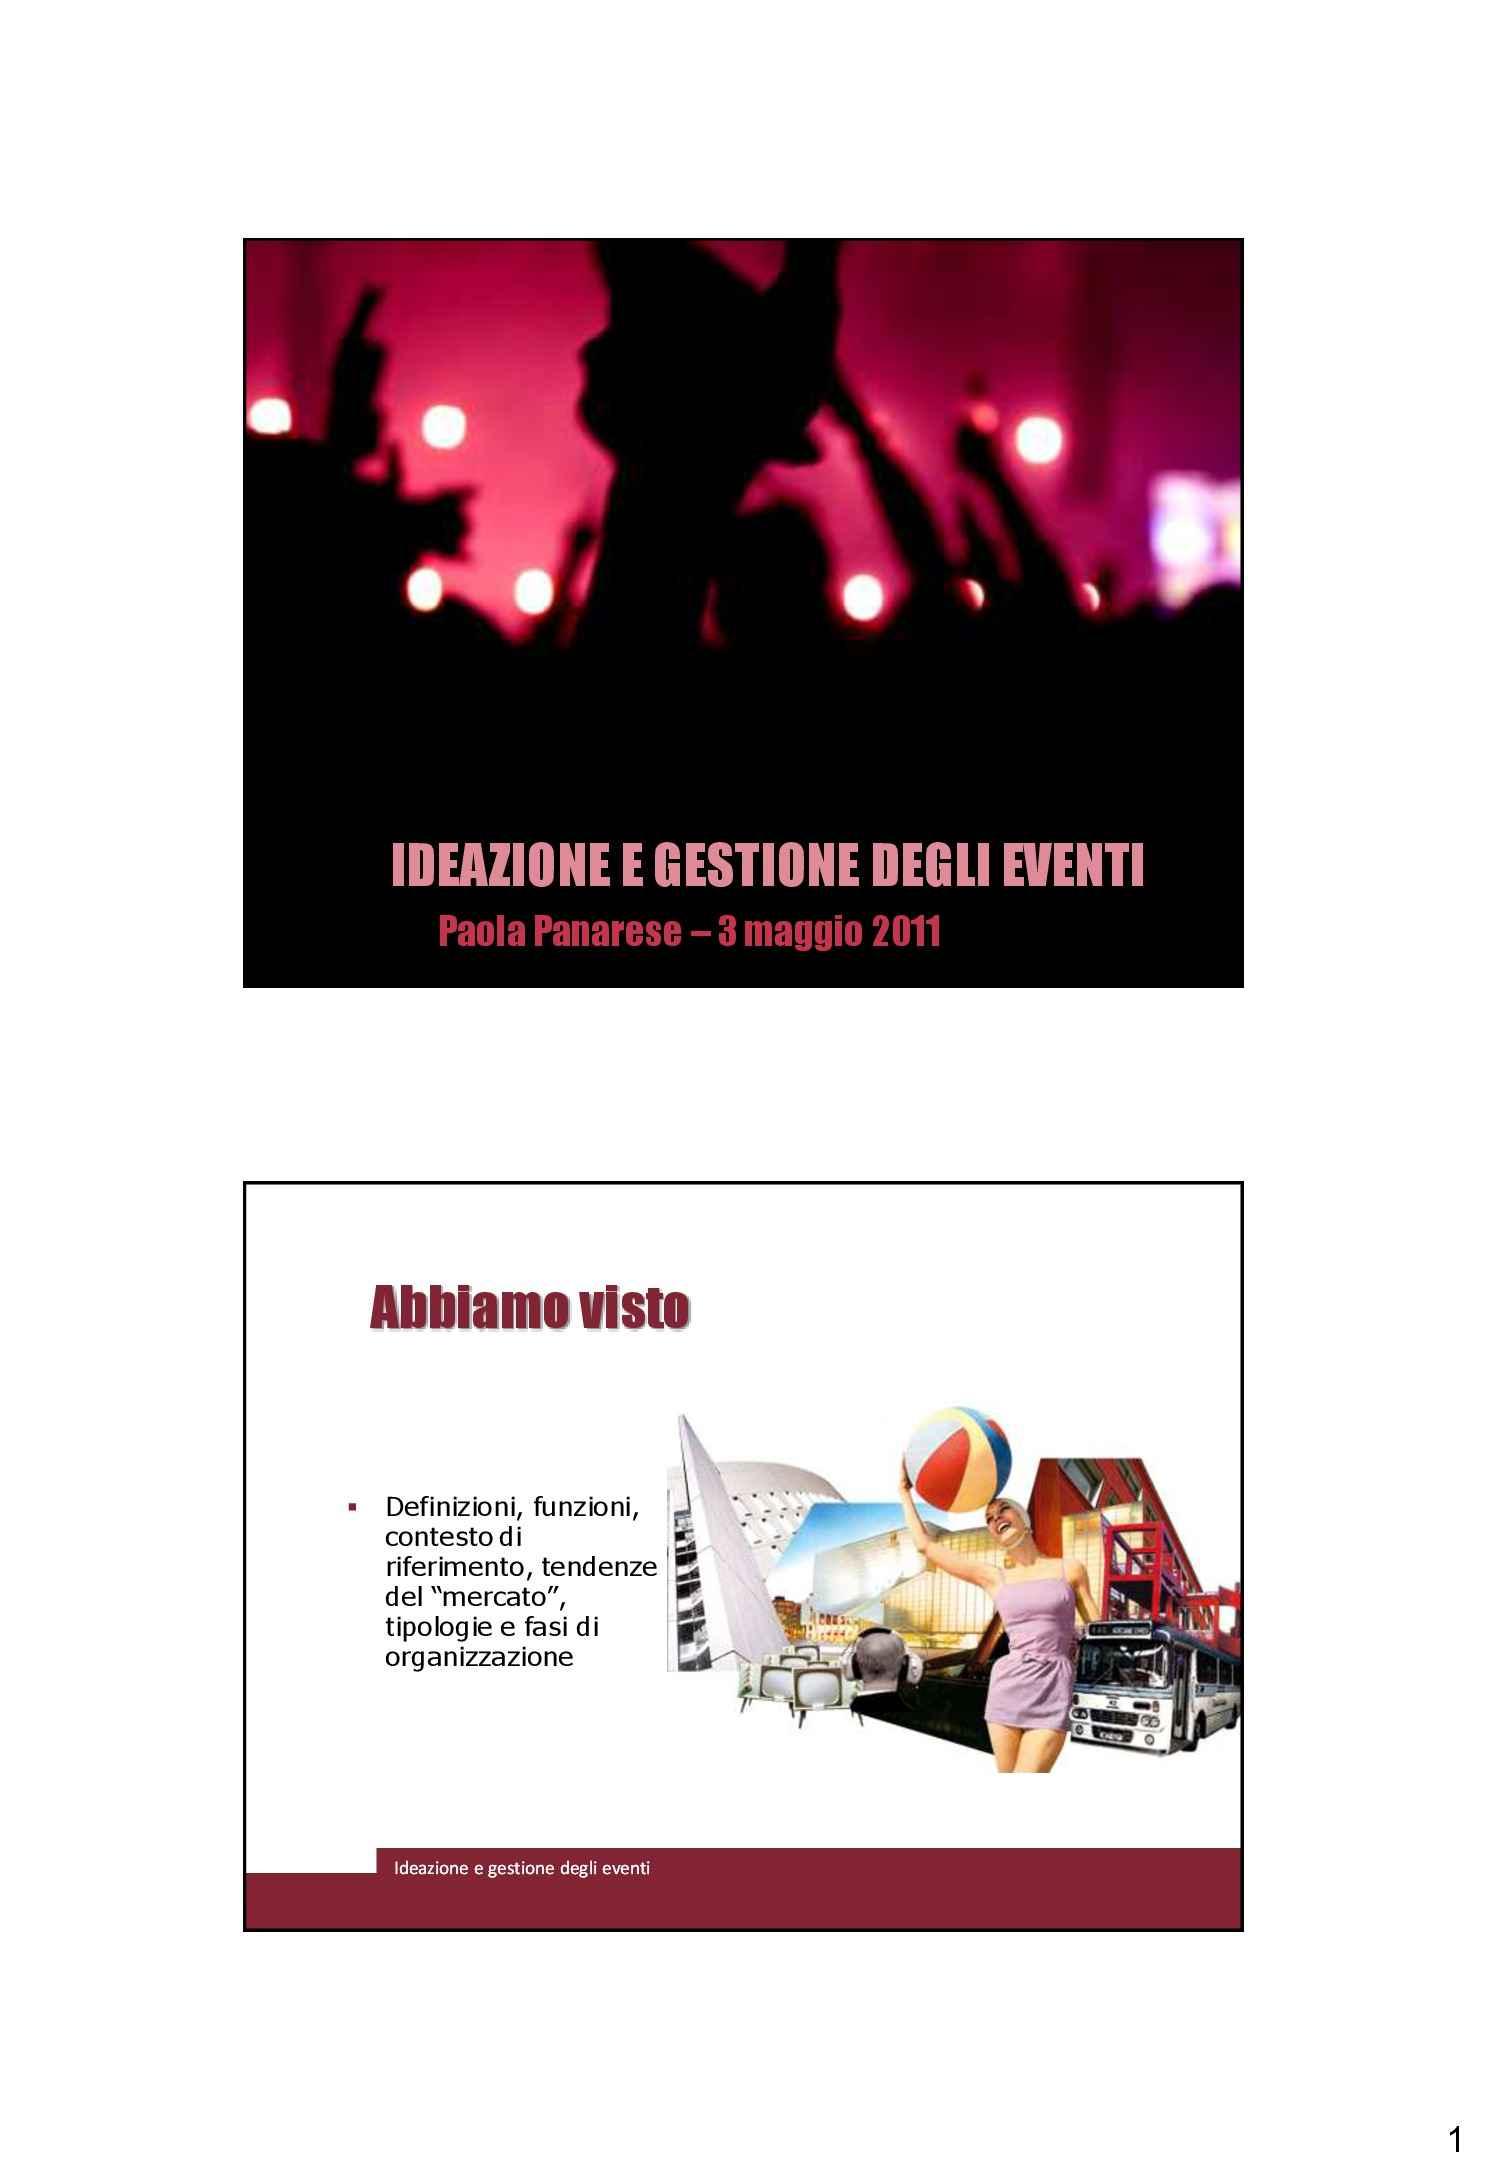 Comunicazione evento - Gruppo Acqua2O